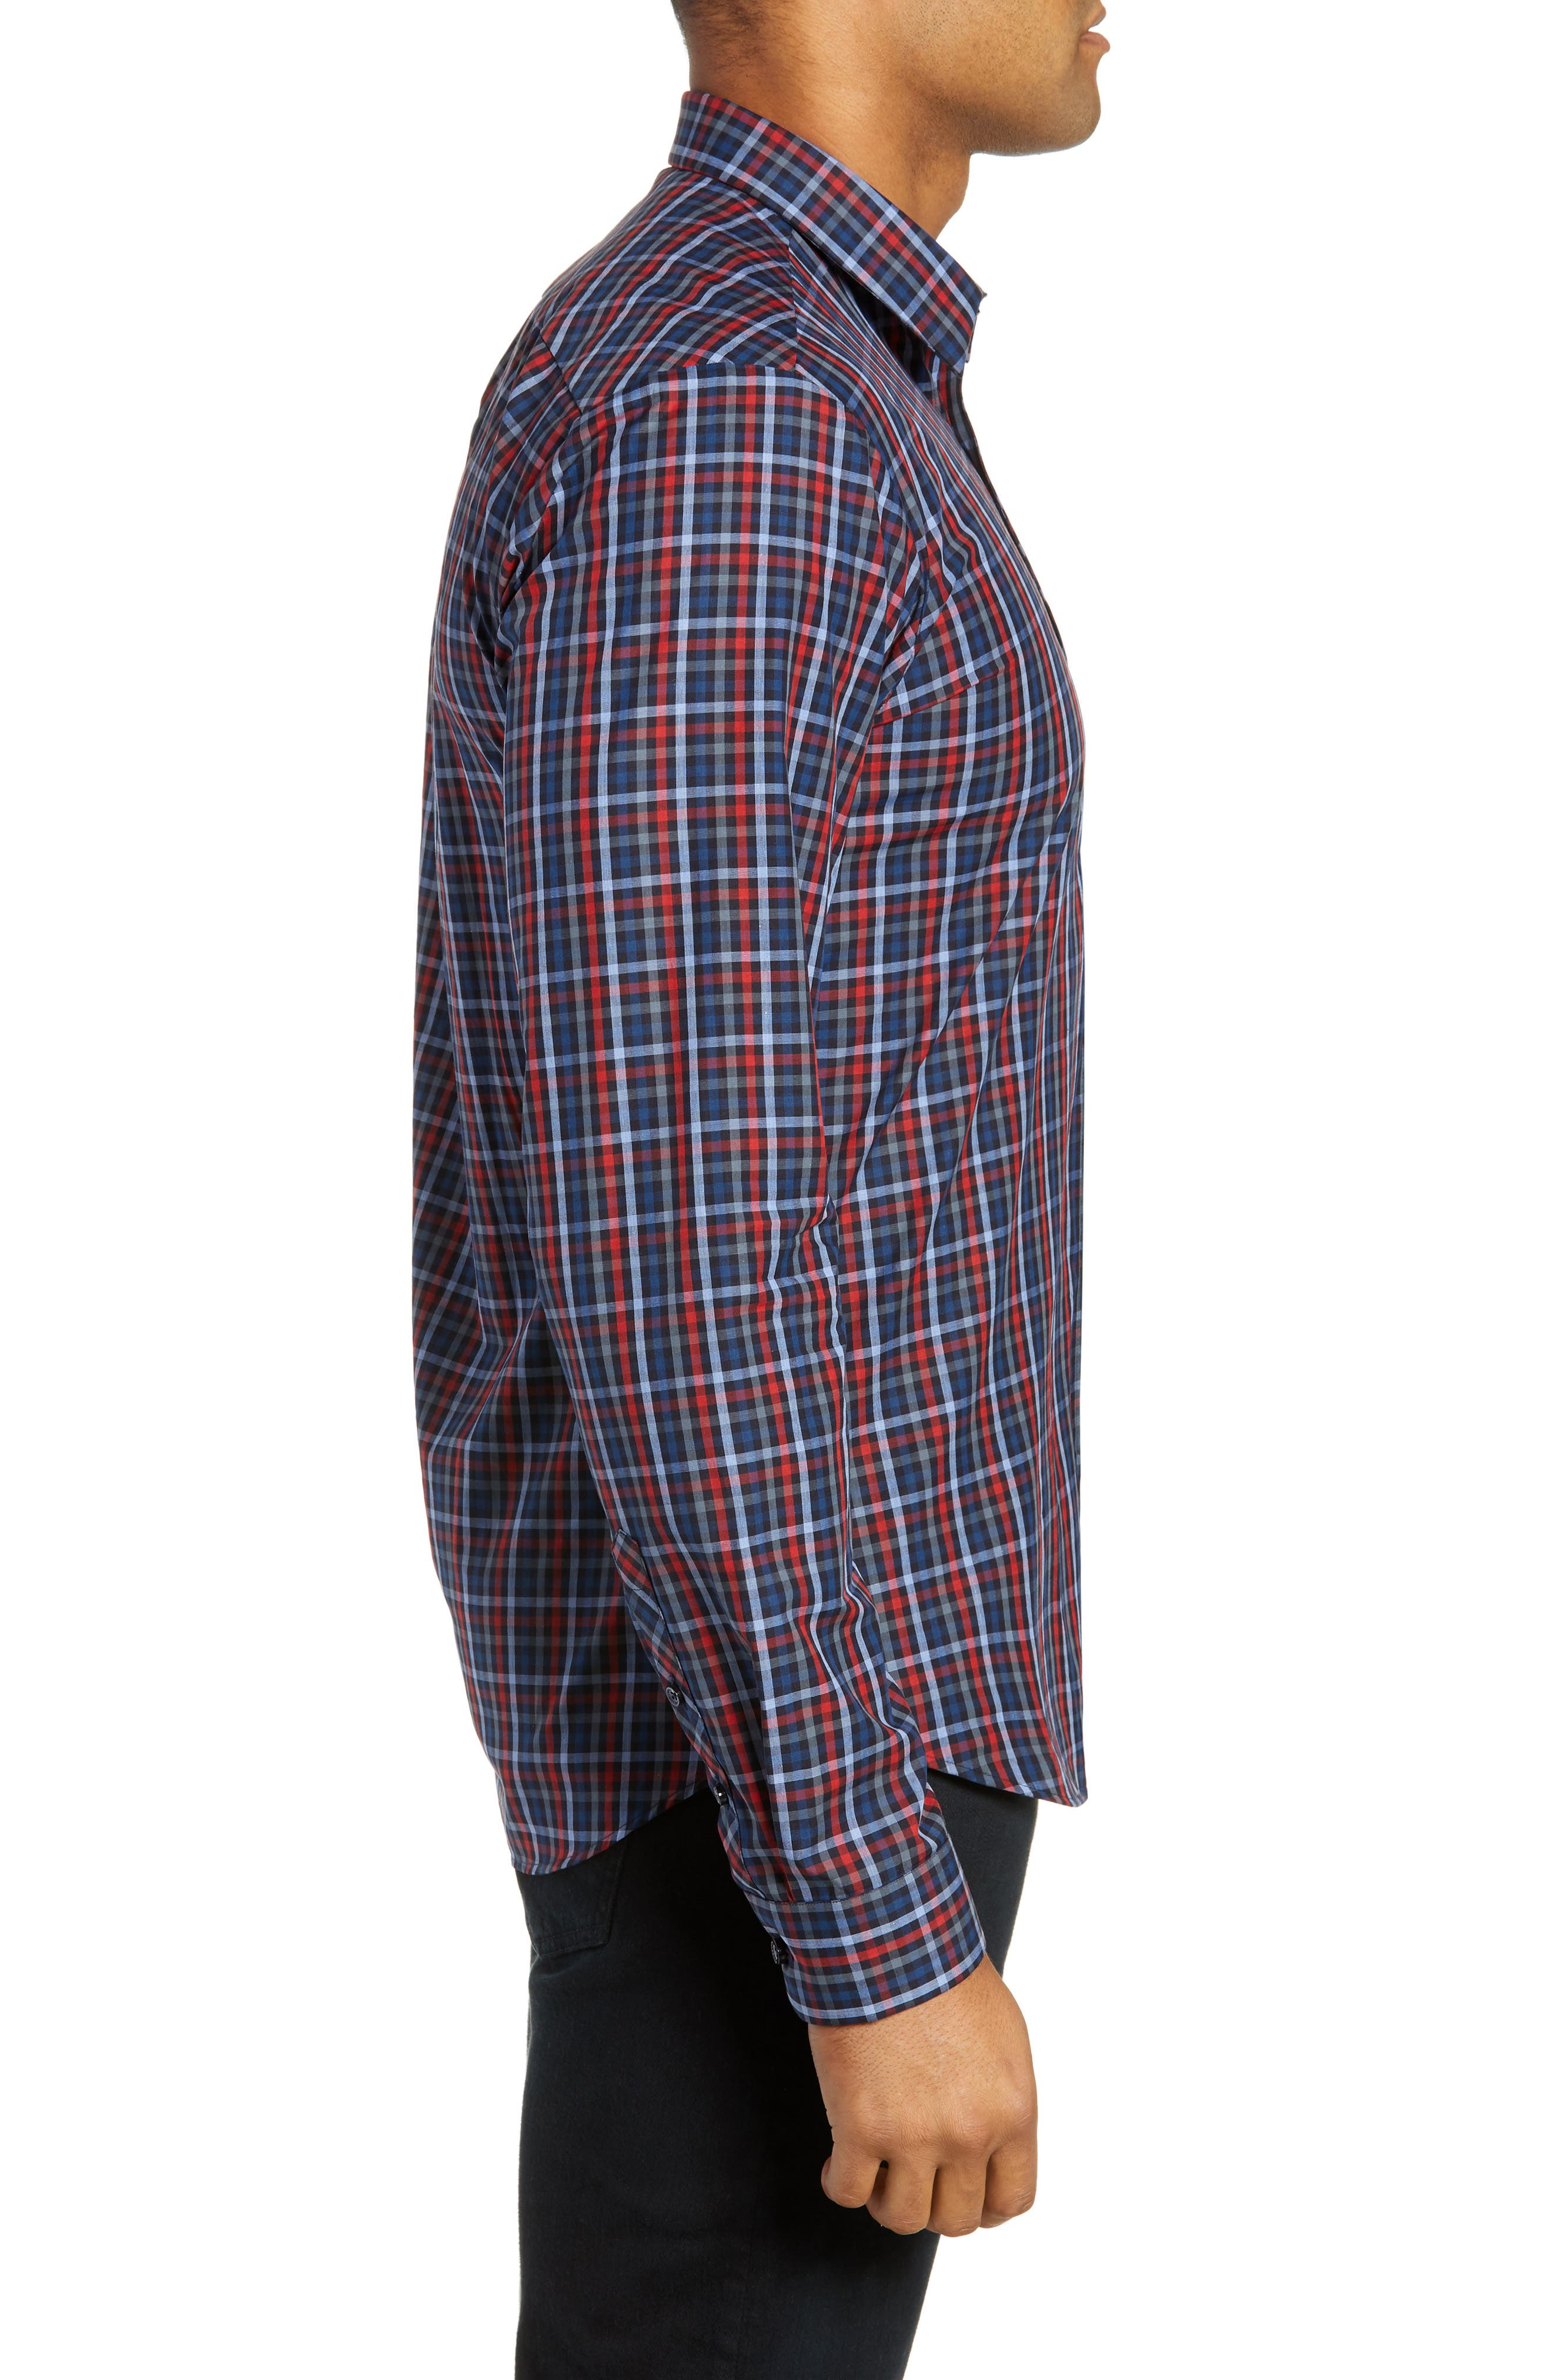 Trim Fit Sport Shirt,                             Alternate thumbnail 4, color,                             RED - BLUE MULTI CHECK